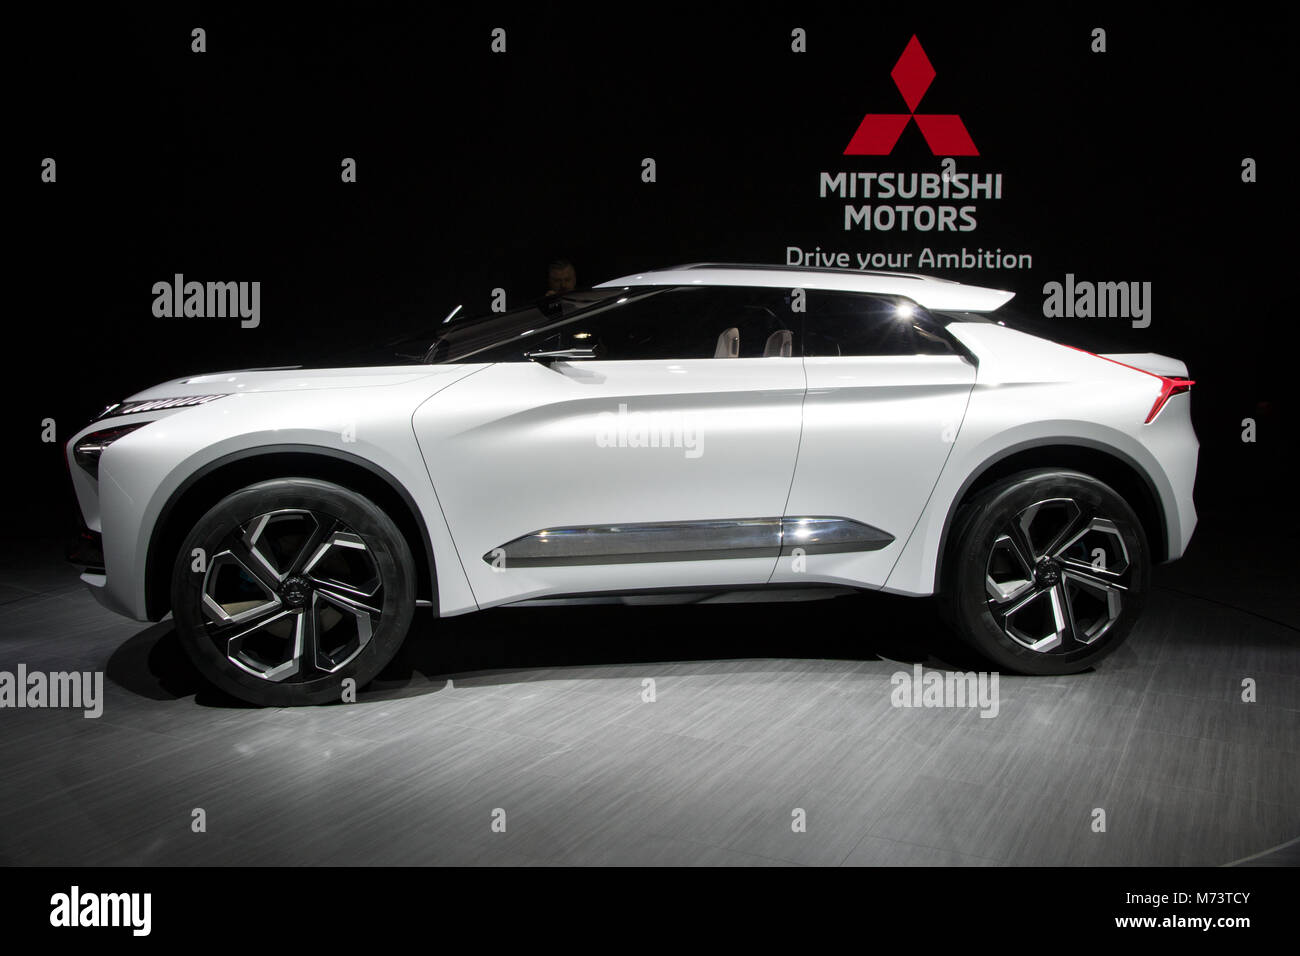 Genf Schweiz 6 Marz 2018 Mitsubishi E Volution Concept Car Das